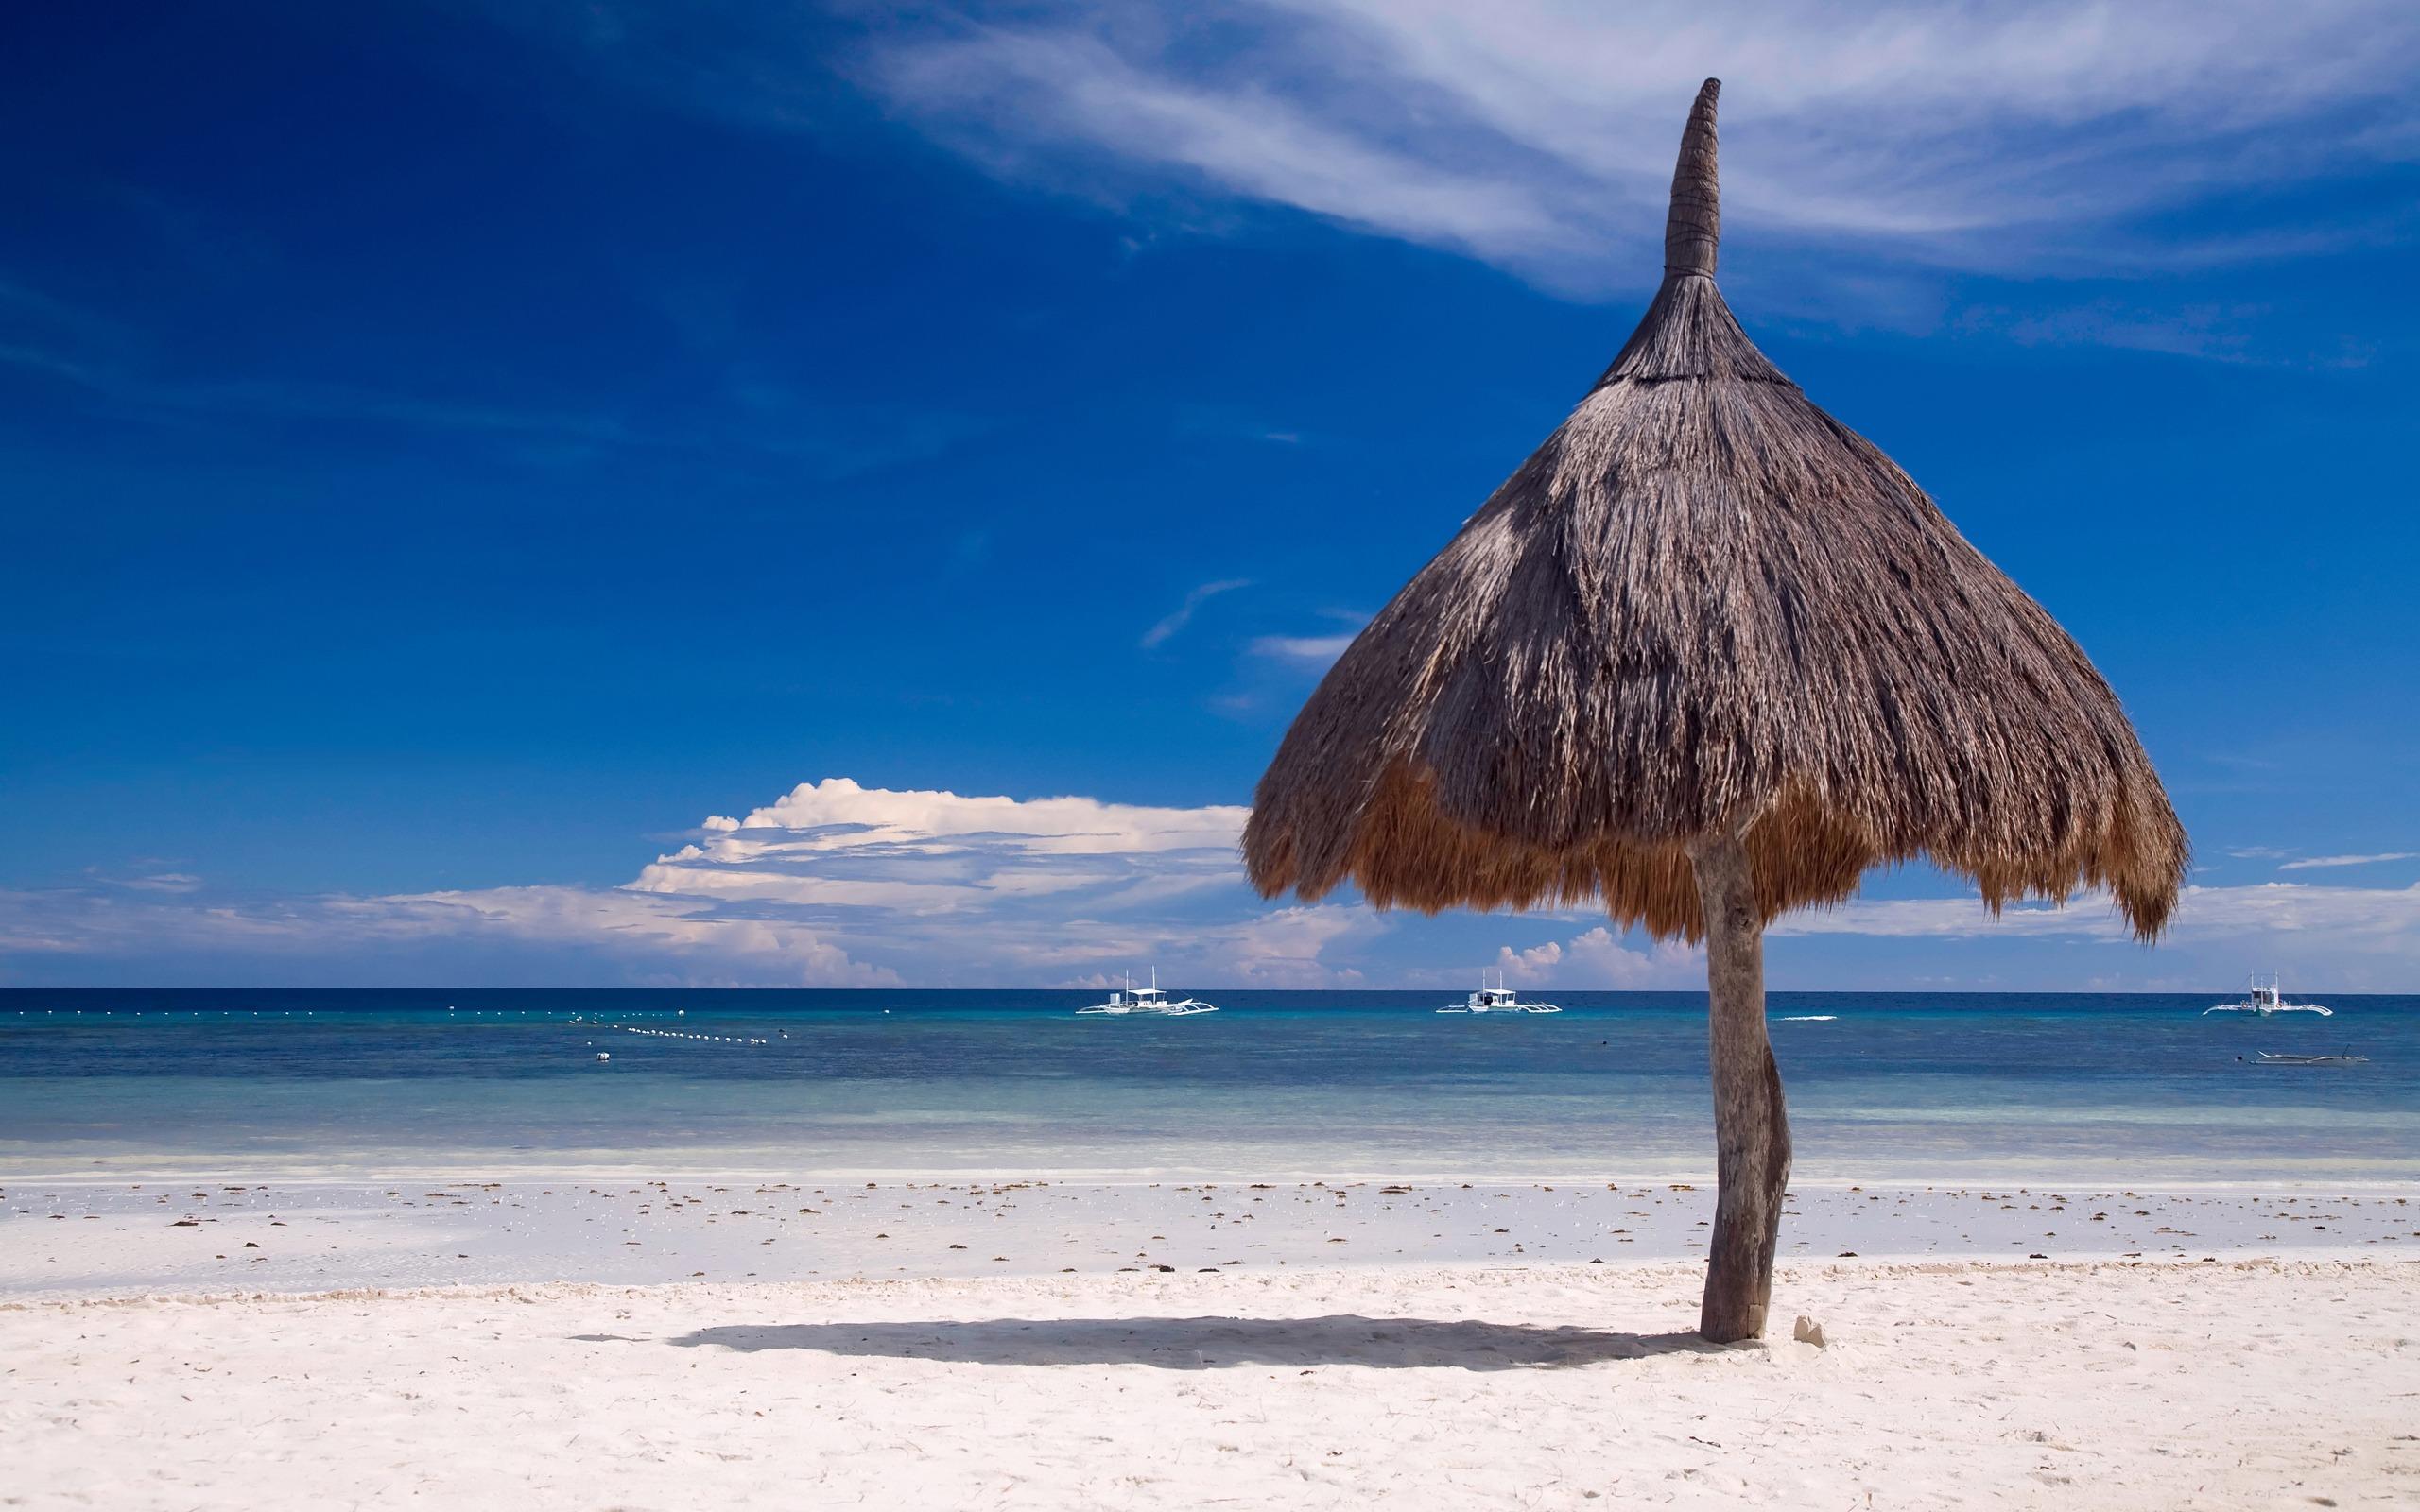 Playa de Punta Sal - 2560x1600